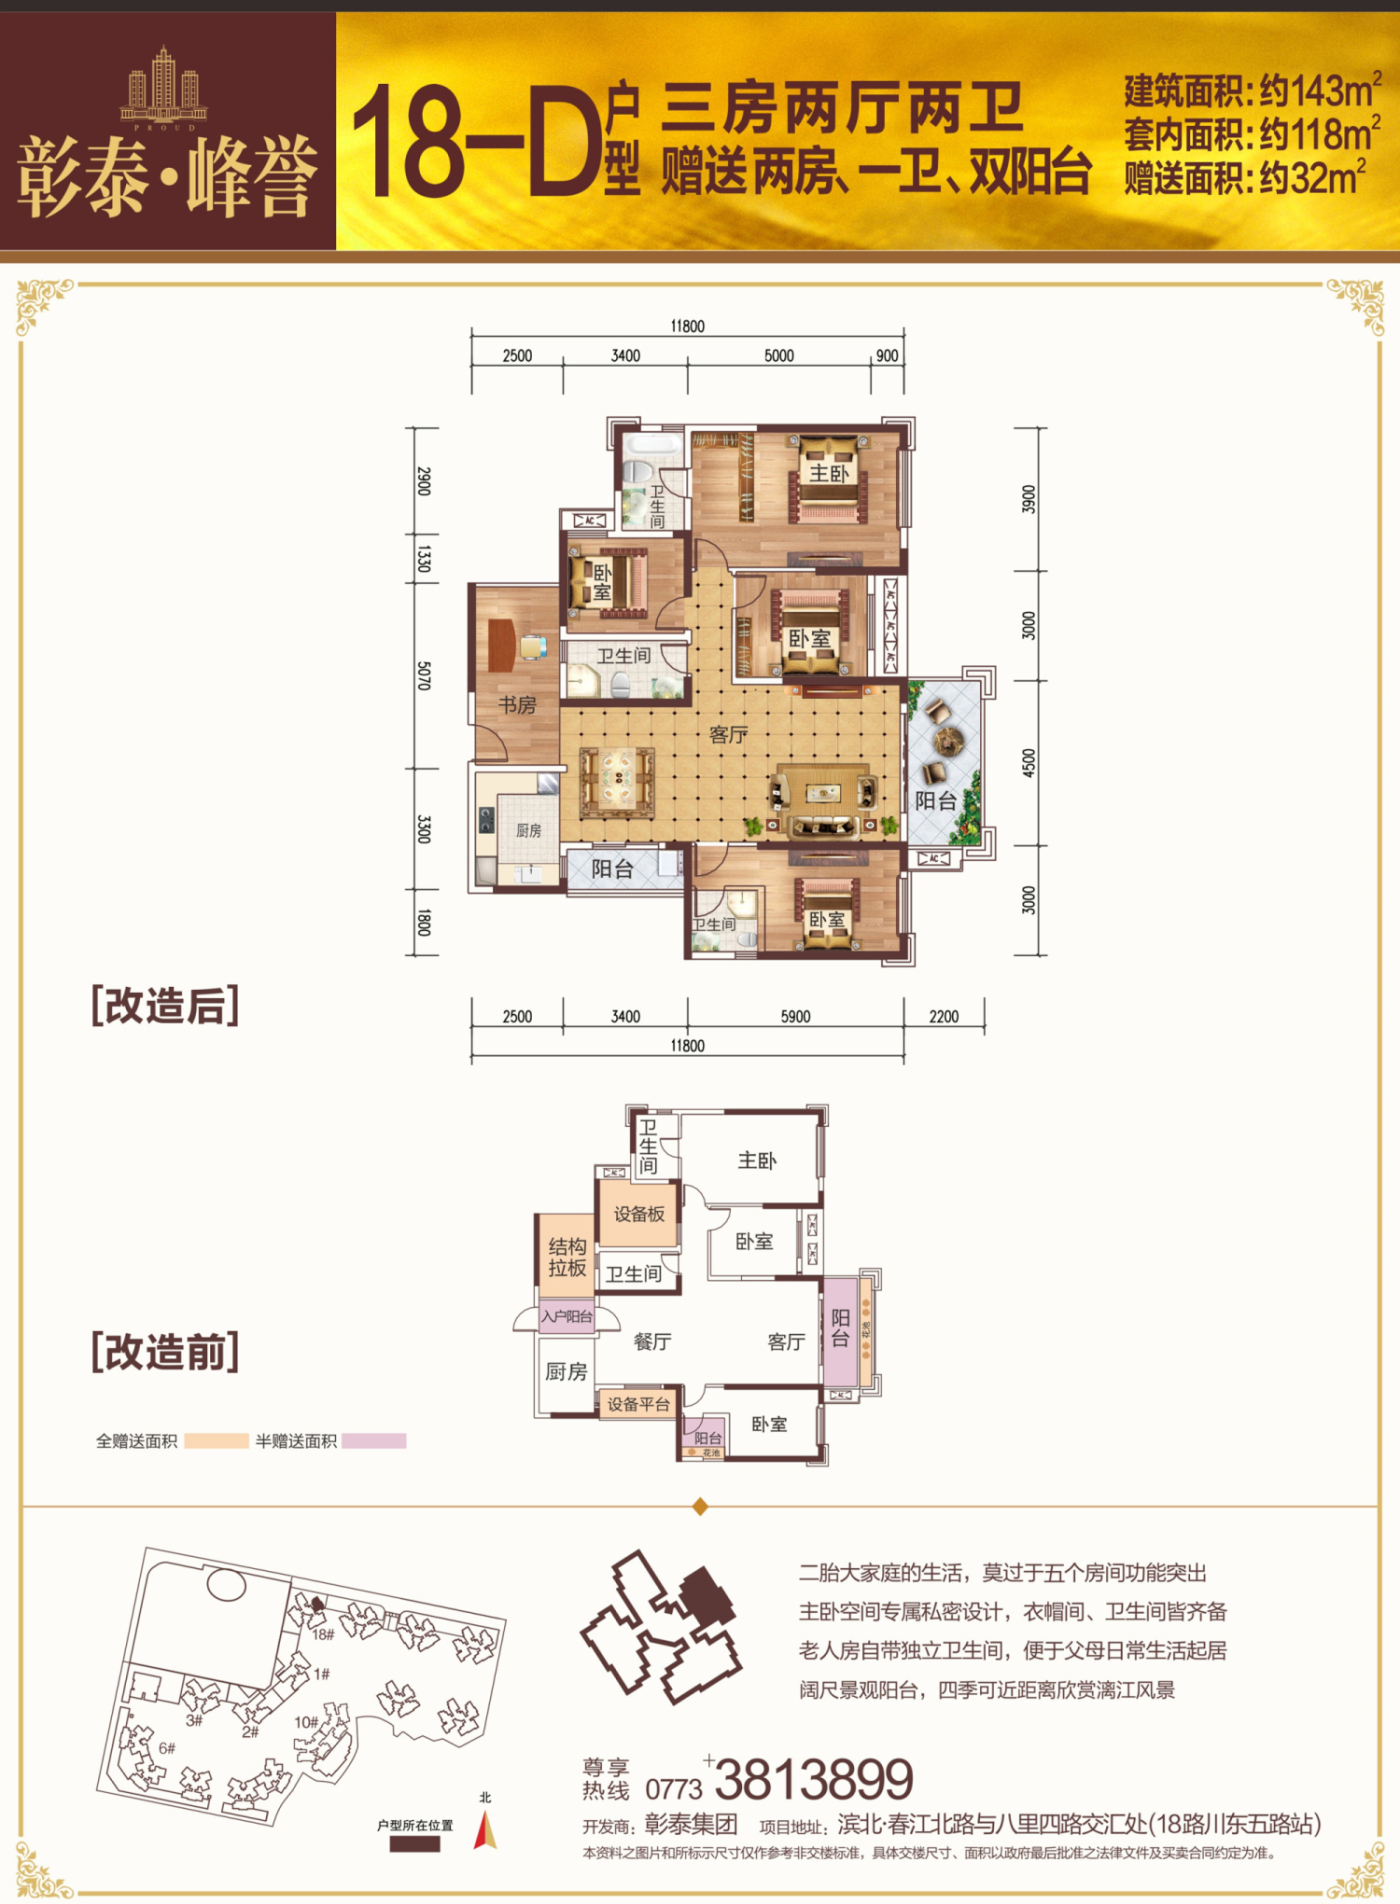 18-D三房两厅两卫